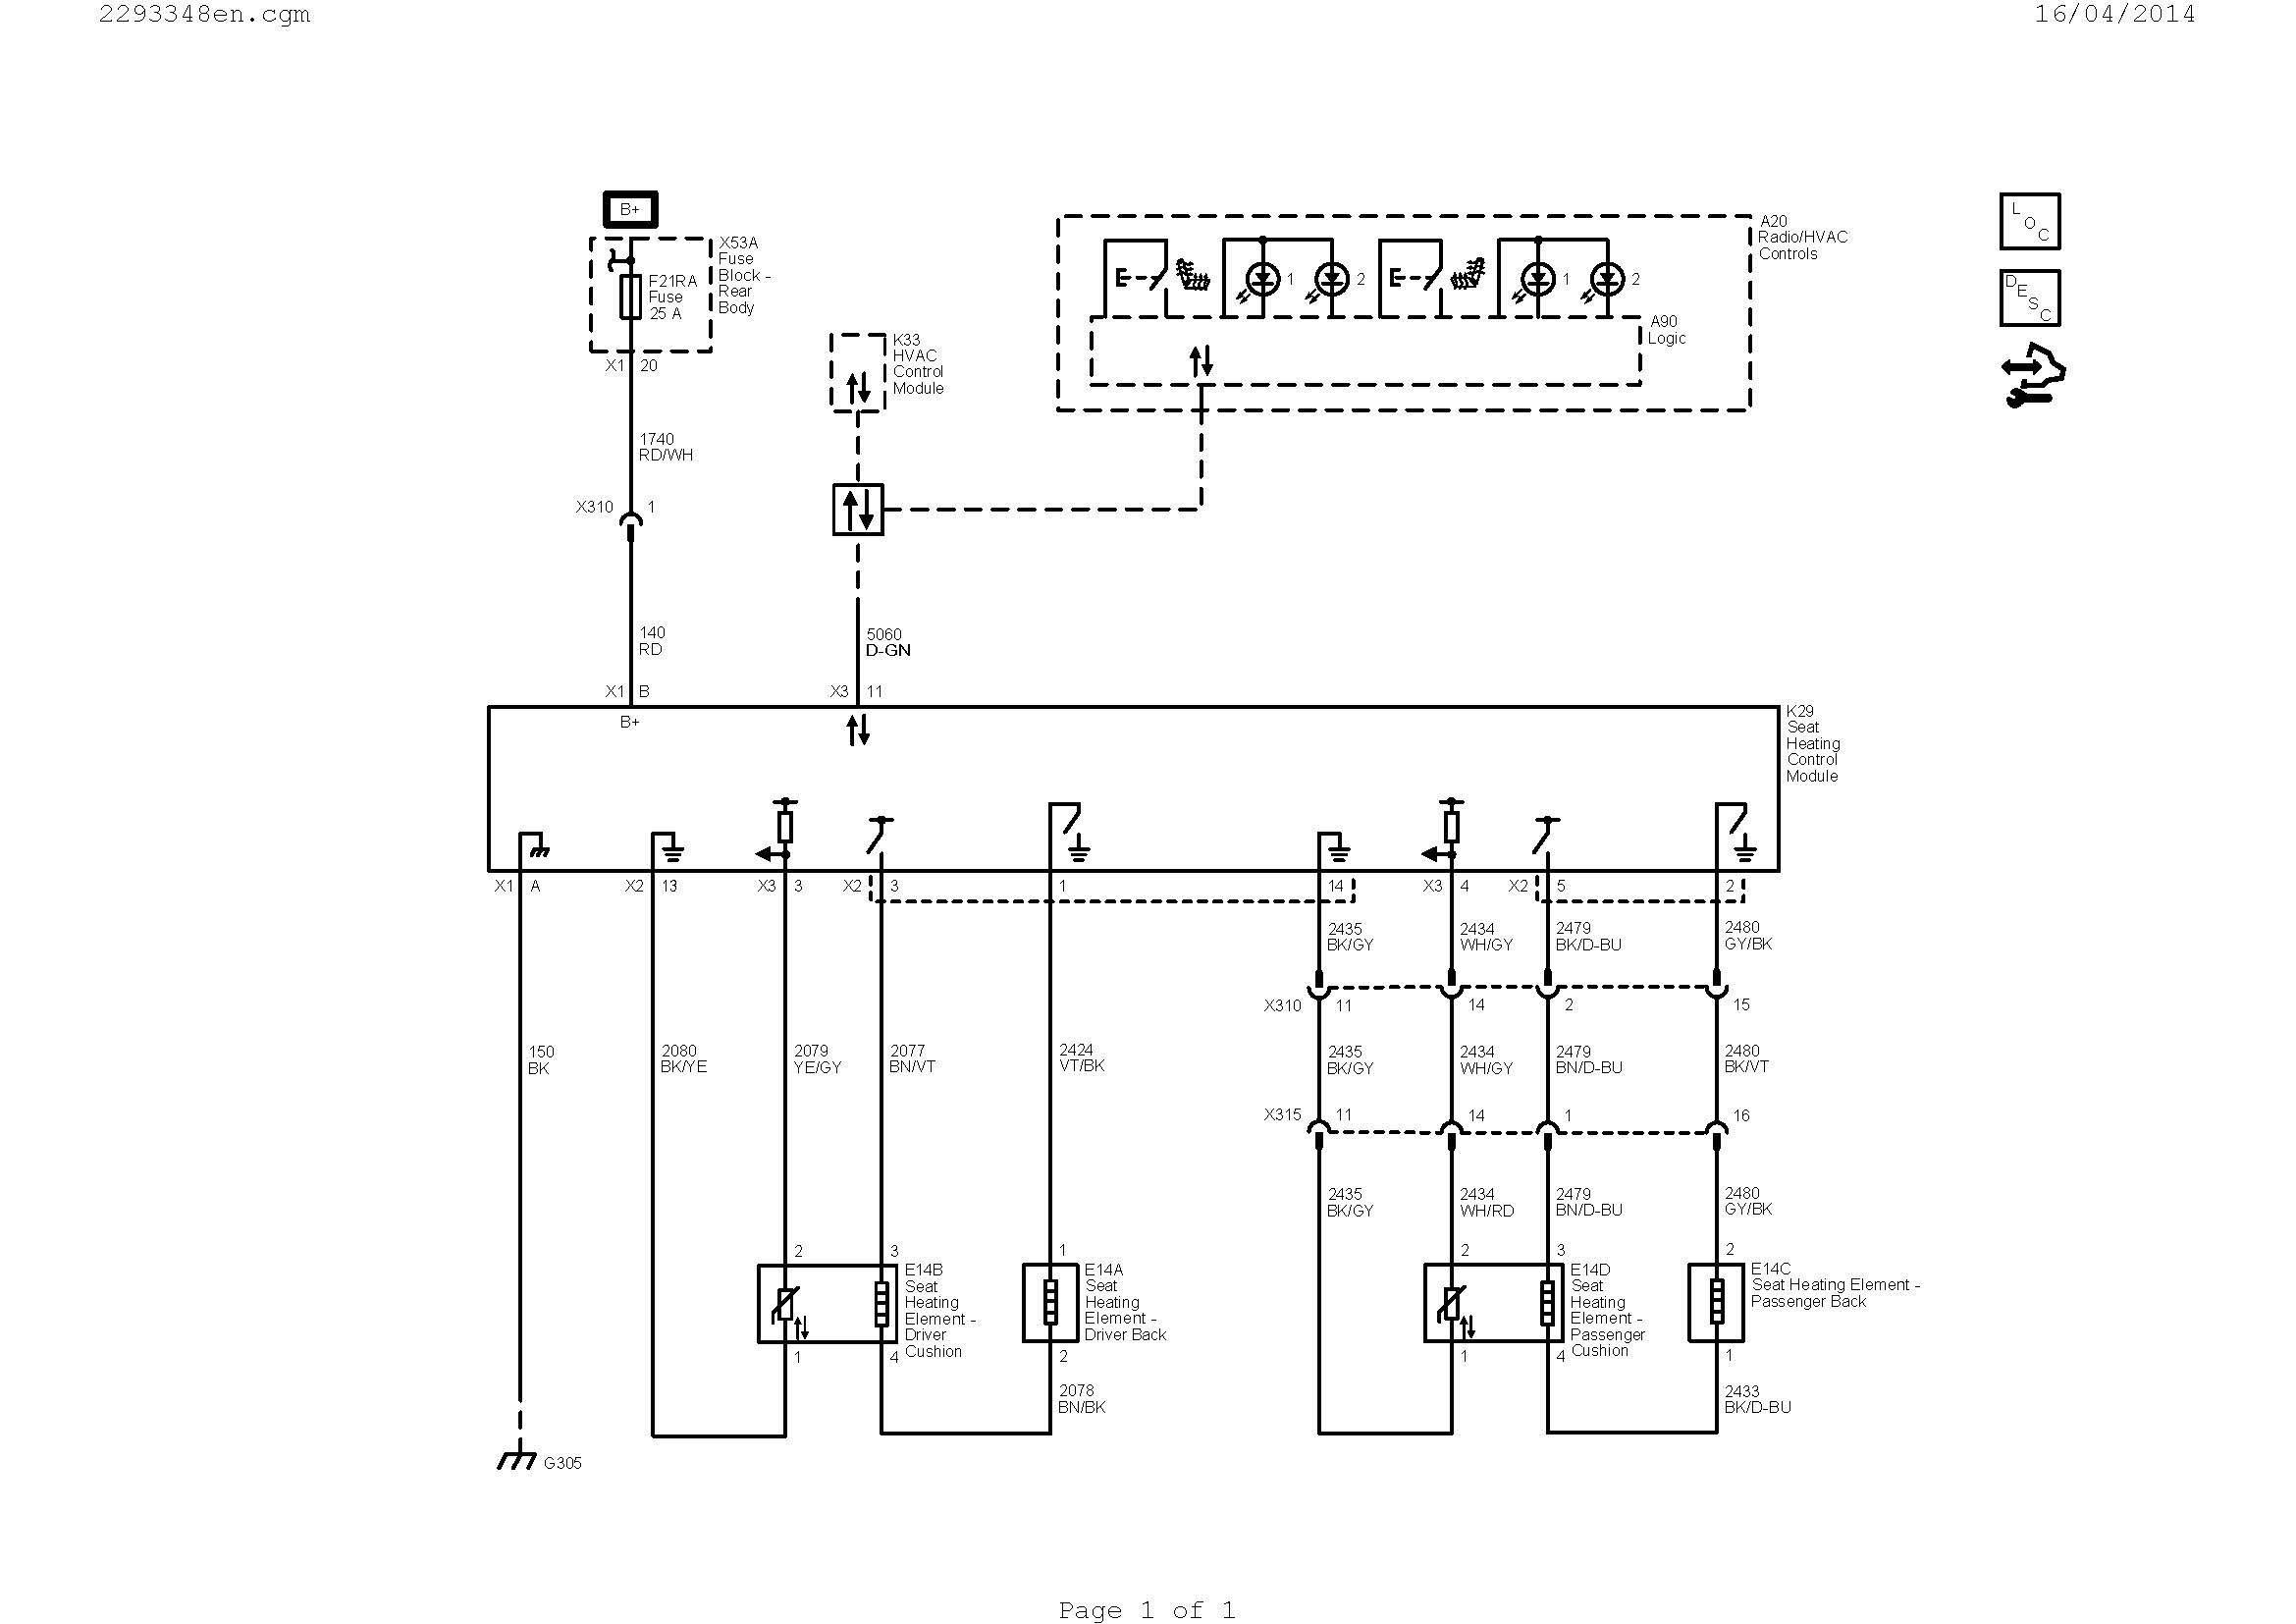 Nest Wireless thermostat Wiring Diagram Refrence Wiring Diagram Ac Valid Hvac Diagram Best Hvac Diagram 0d